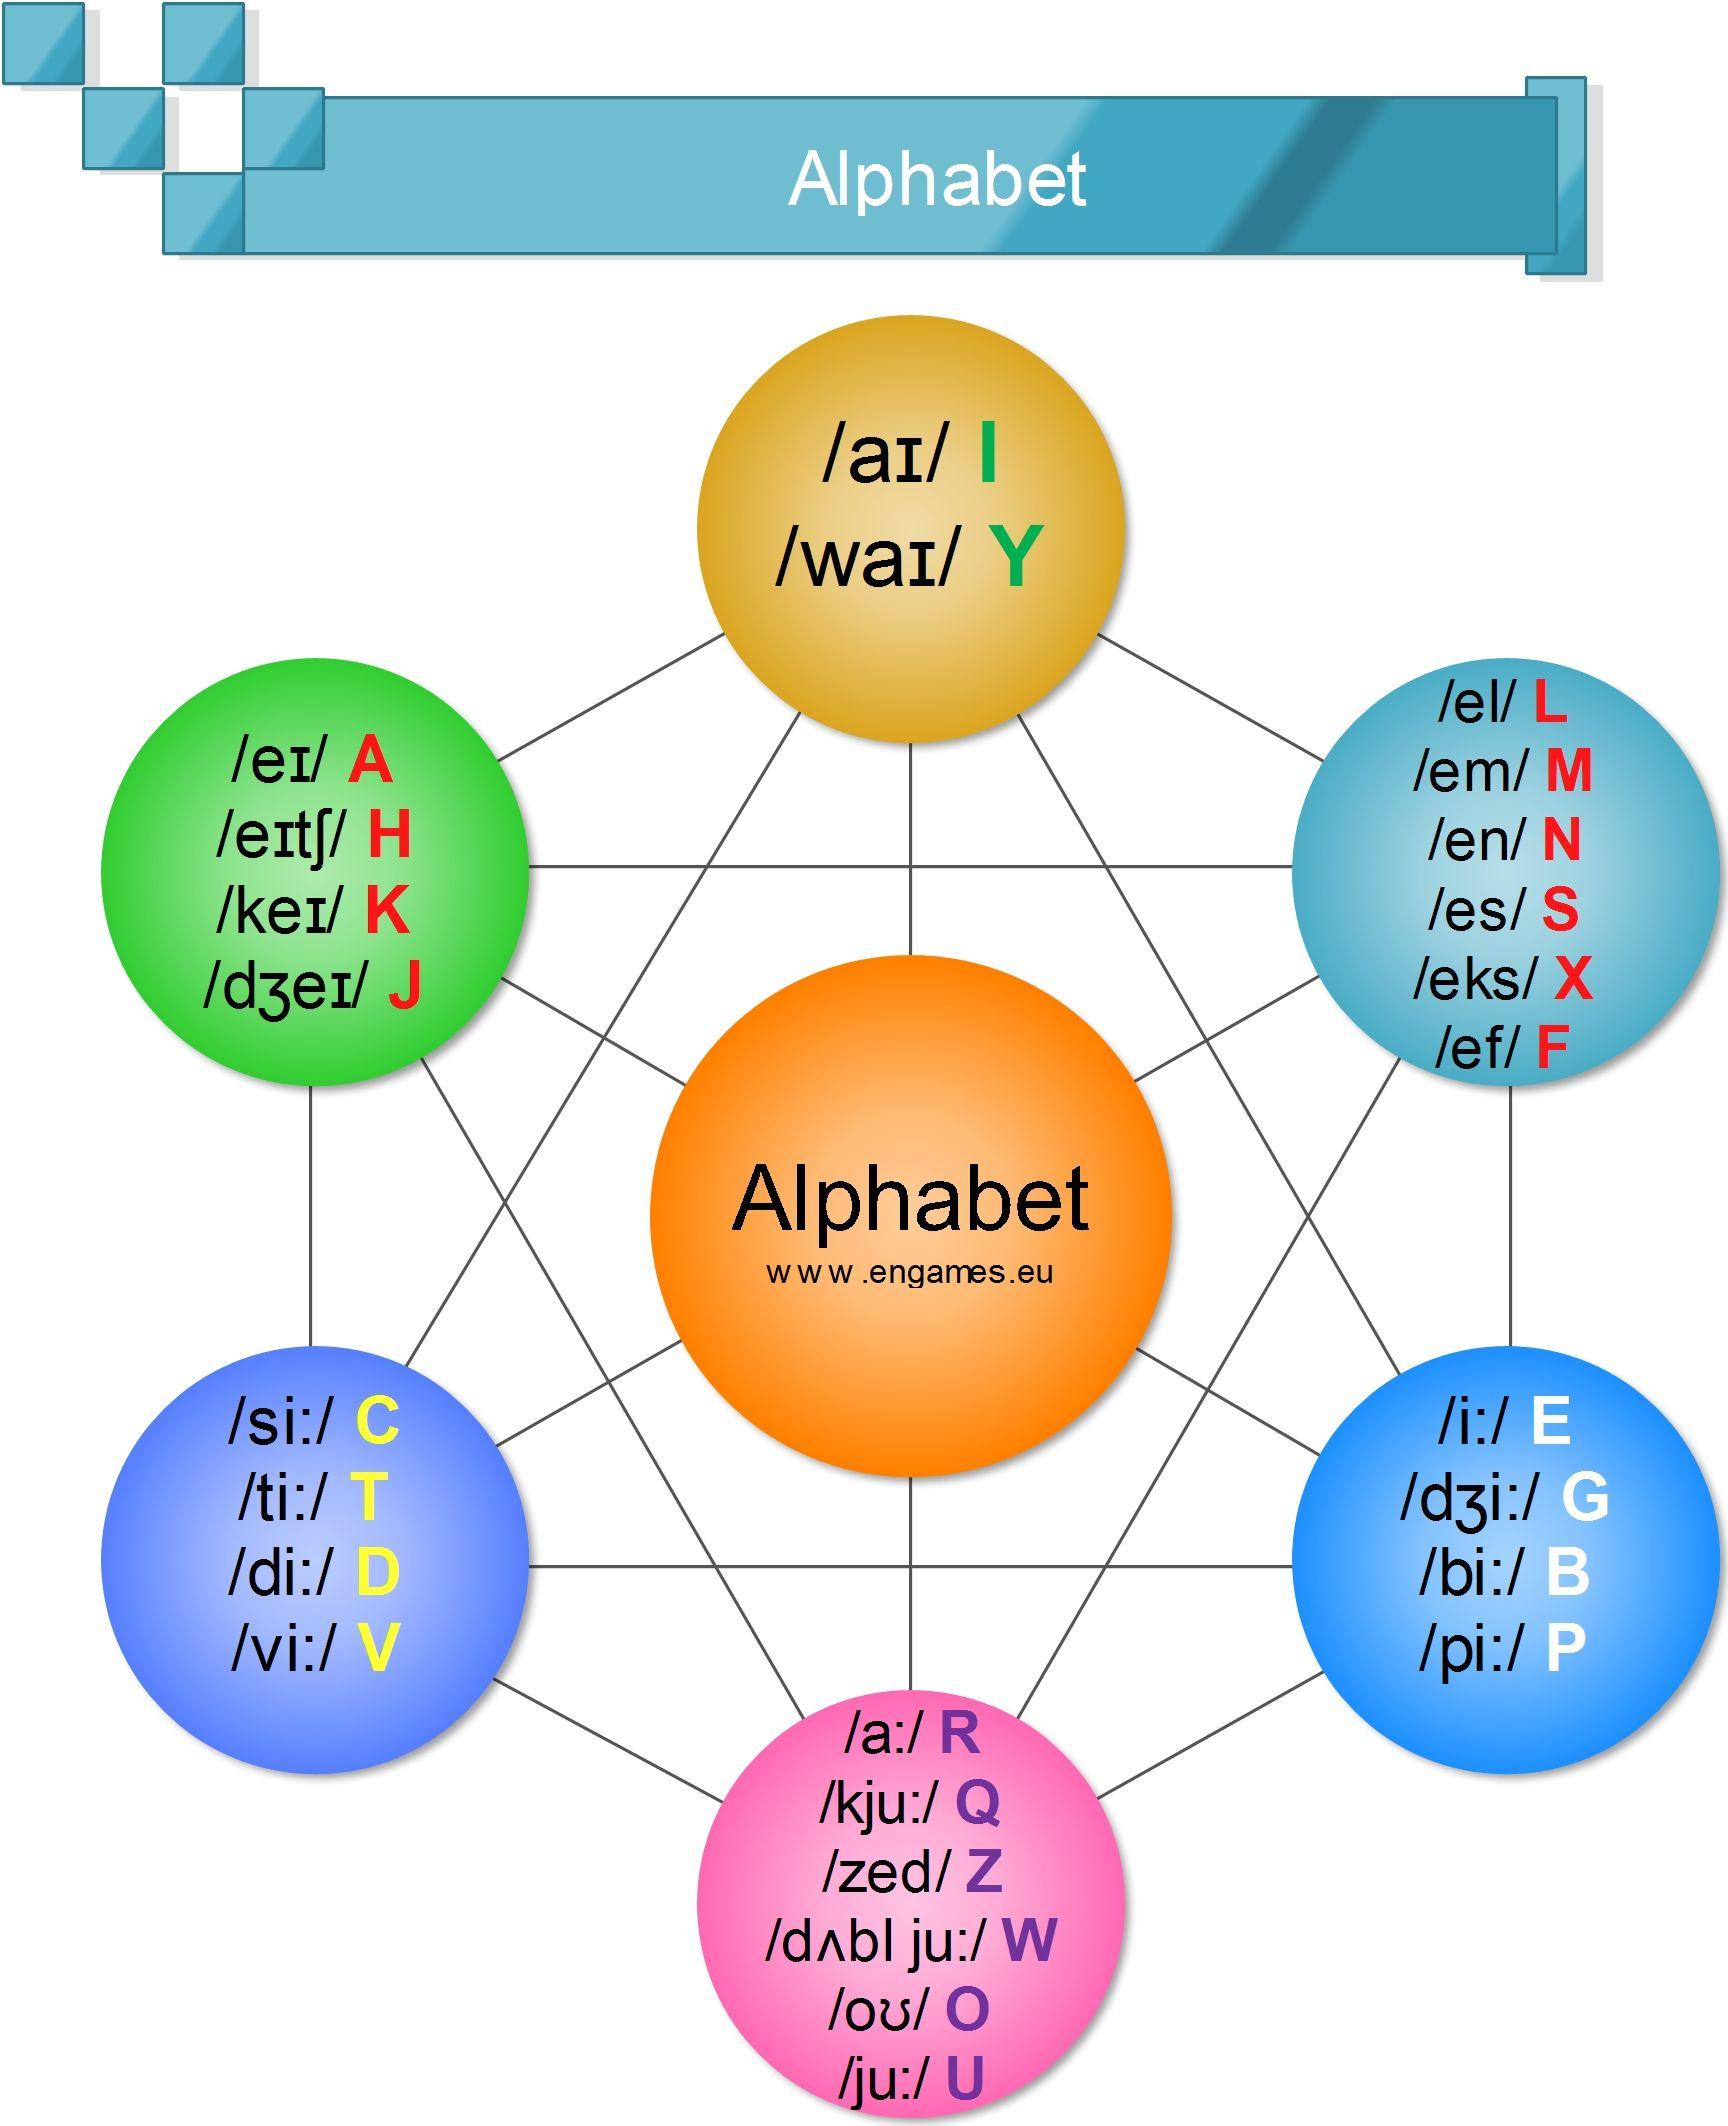 Alphabet – audio lingual method